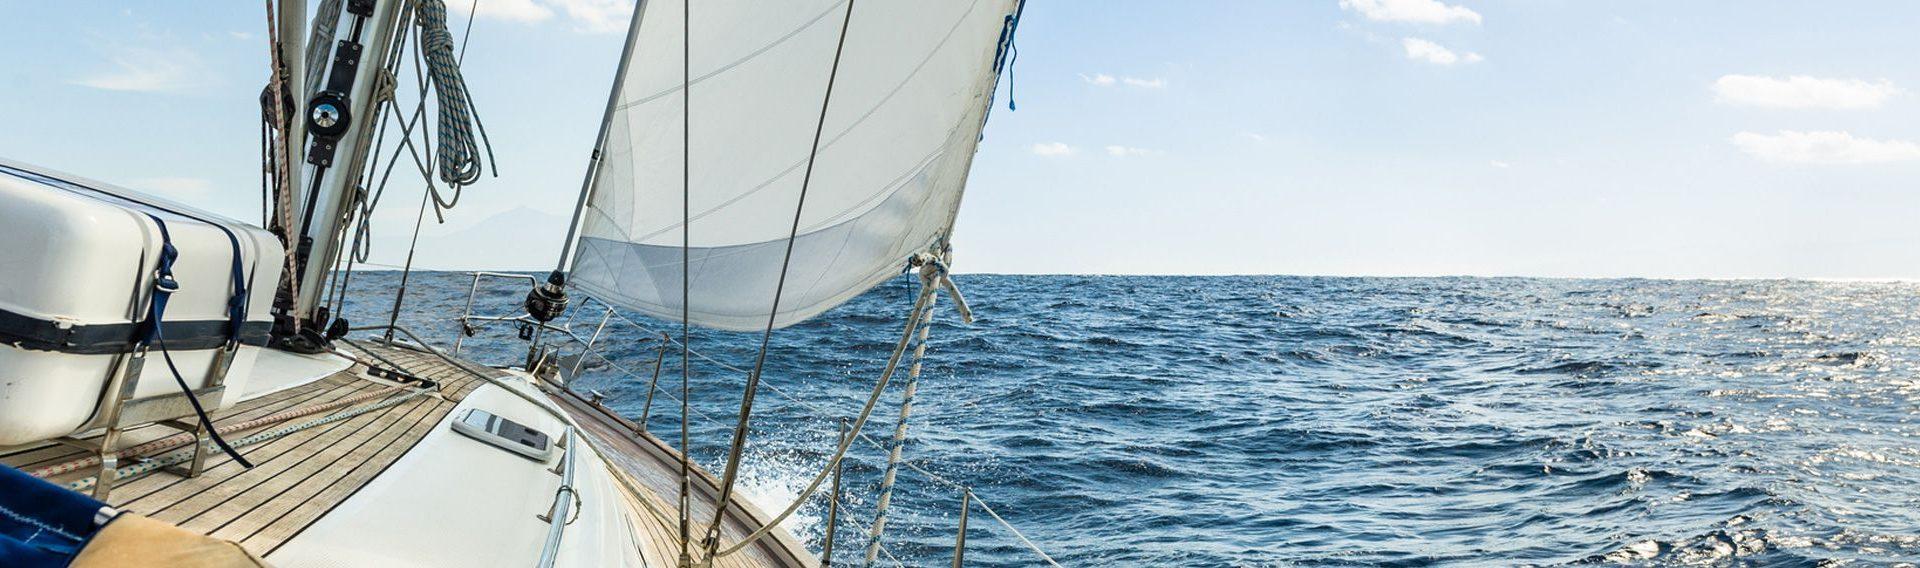 Yachting bei Baltic Kölln